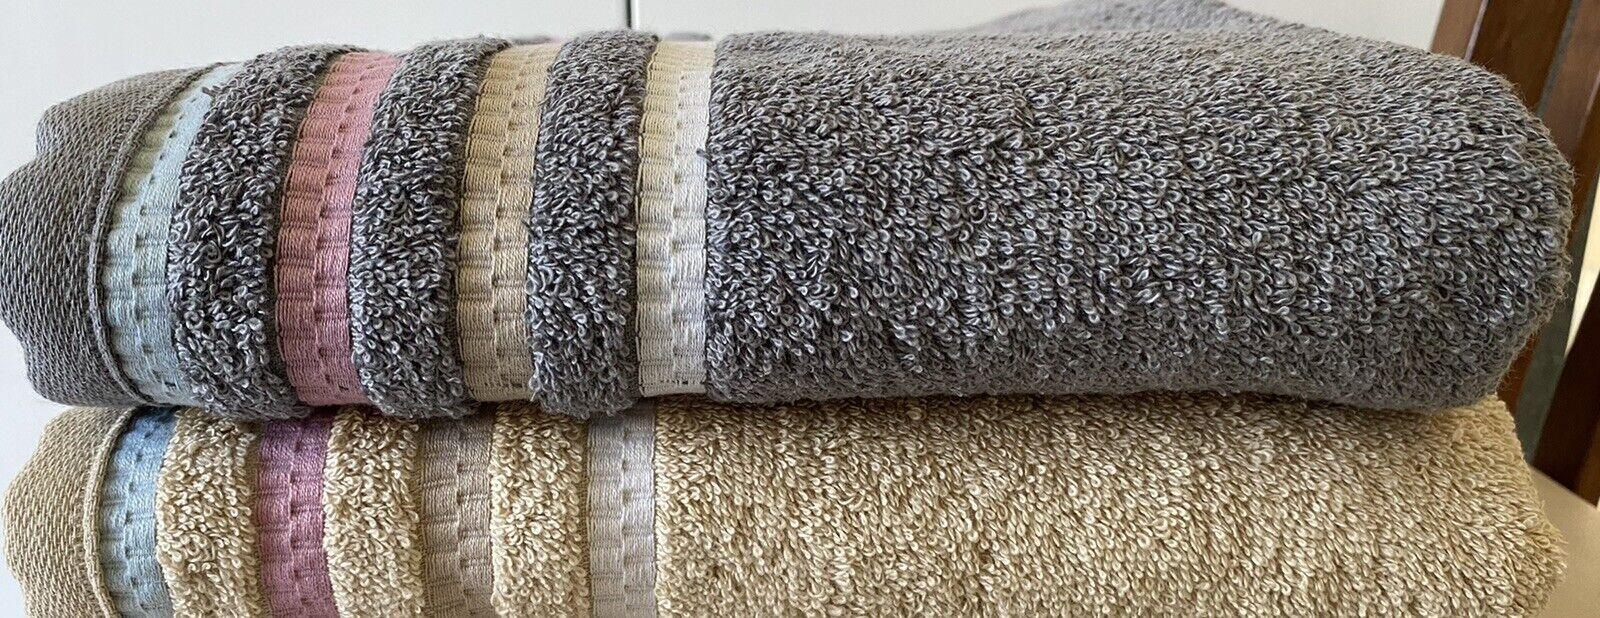 PREMIUM HOTEL QUALITY VOSSEN Bath Towel RRP -SAVE & FREE DELIVERY